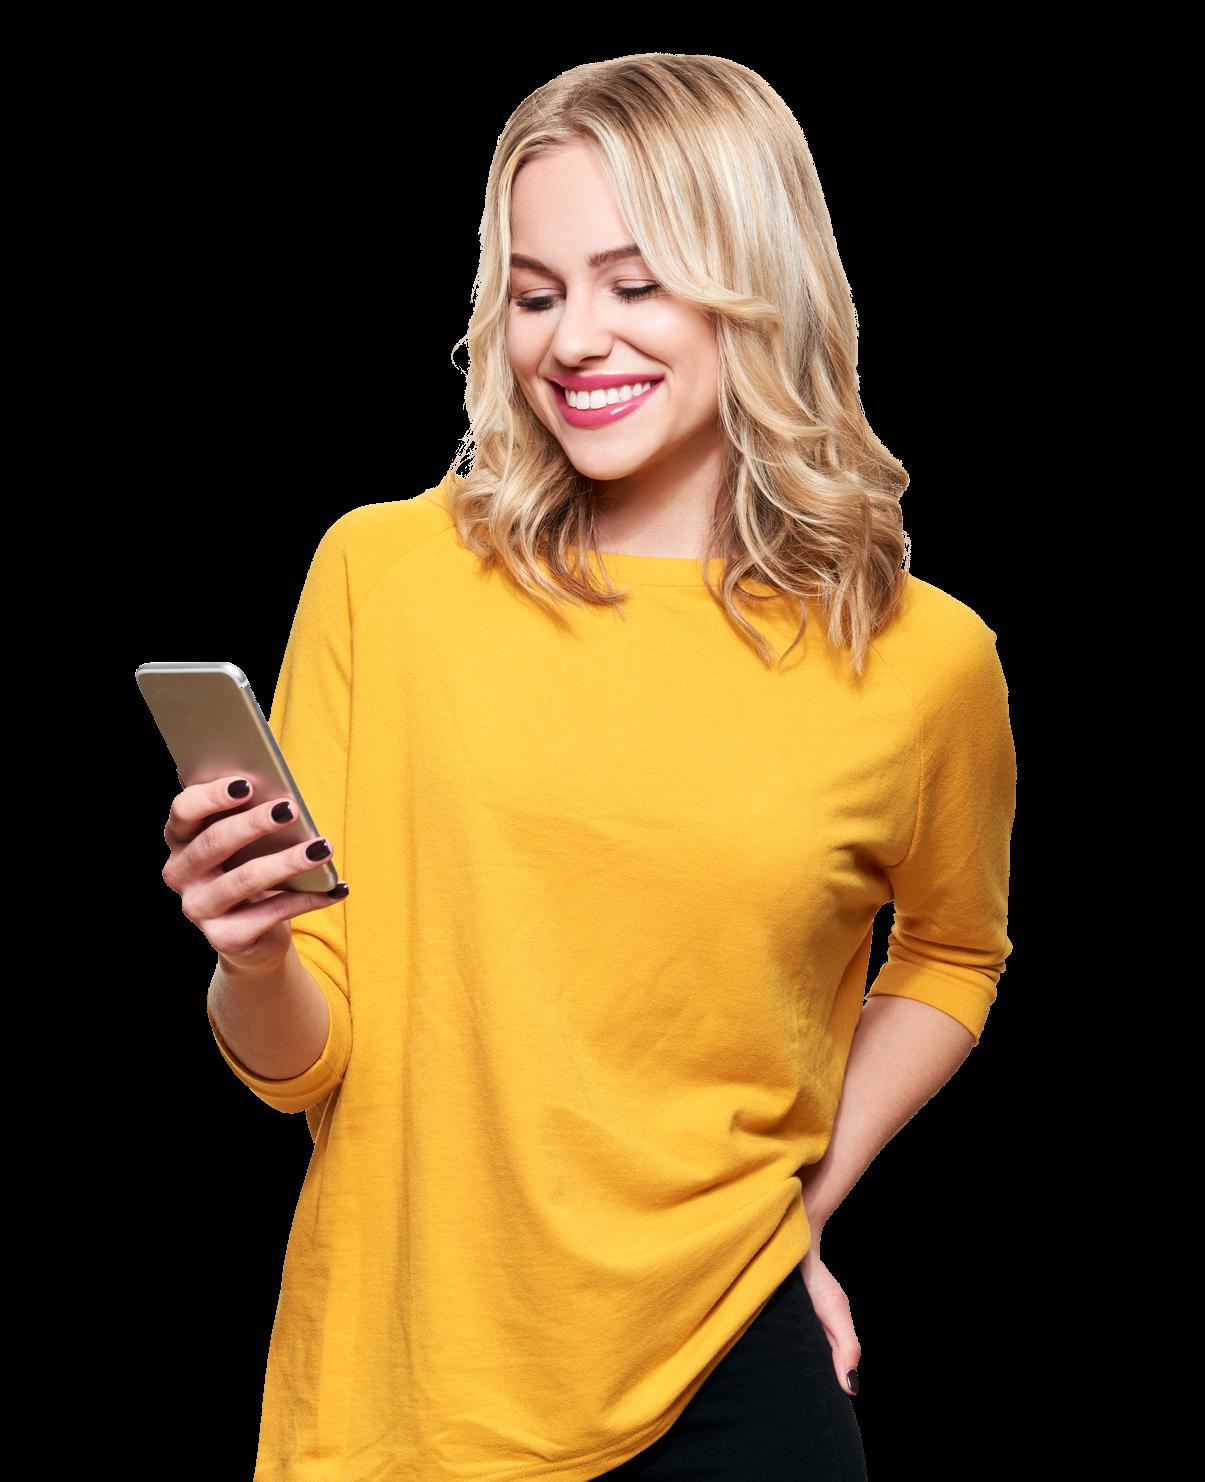 https://conversity--live.s3.amazonaws.com/uploads/2021/10/Blond-Woman-Using-Phone-No-Background-Crop-Narrow-3.png